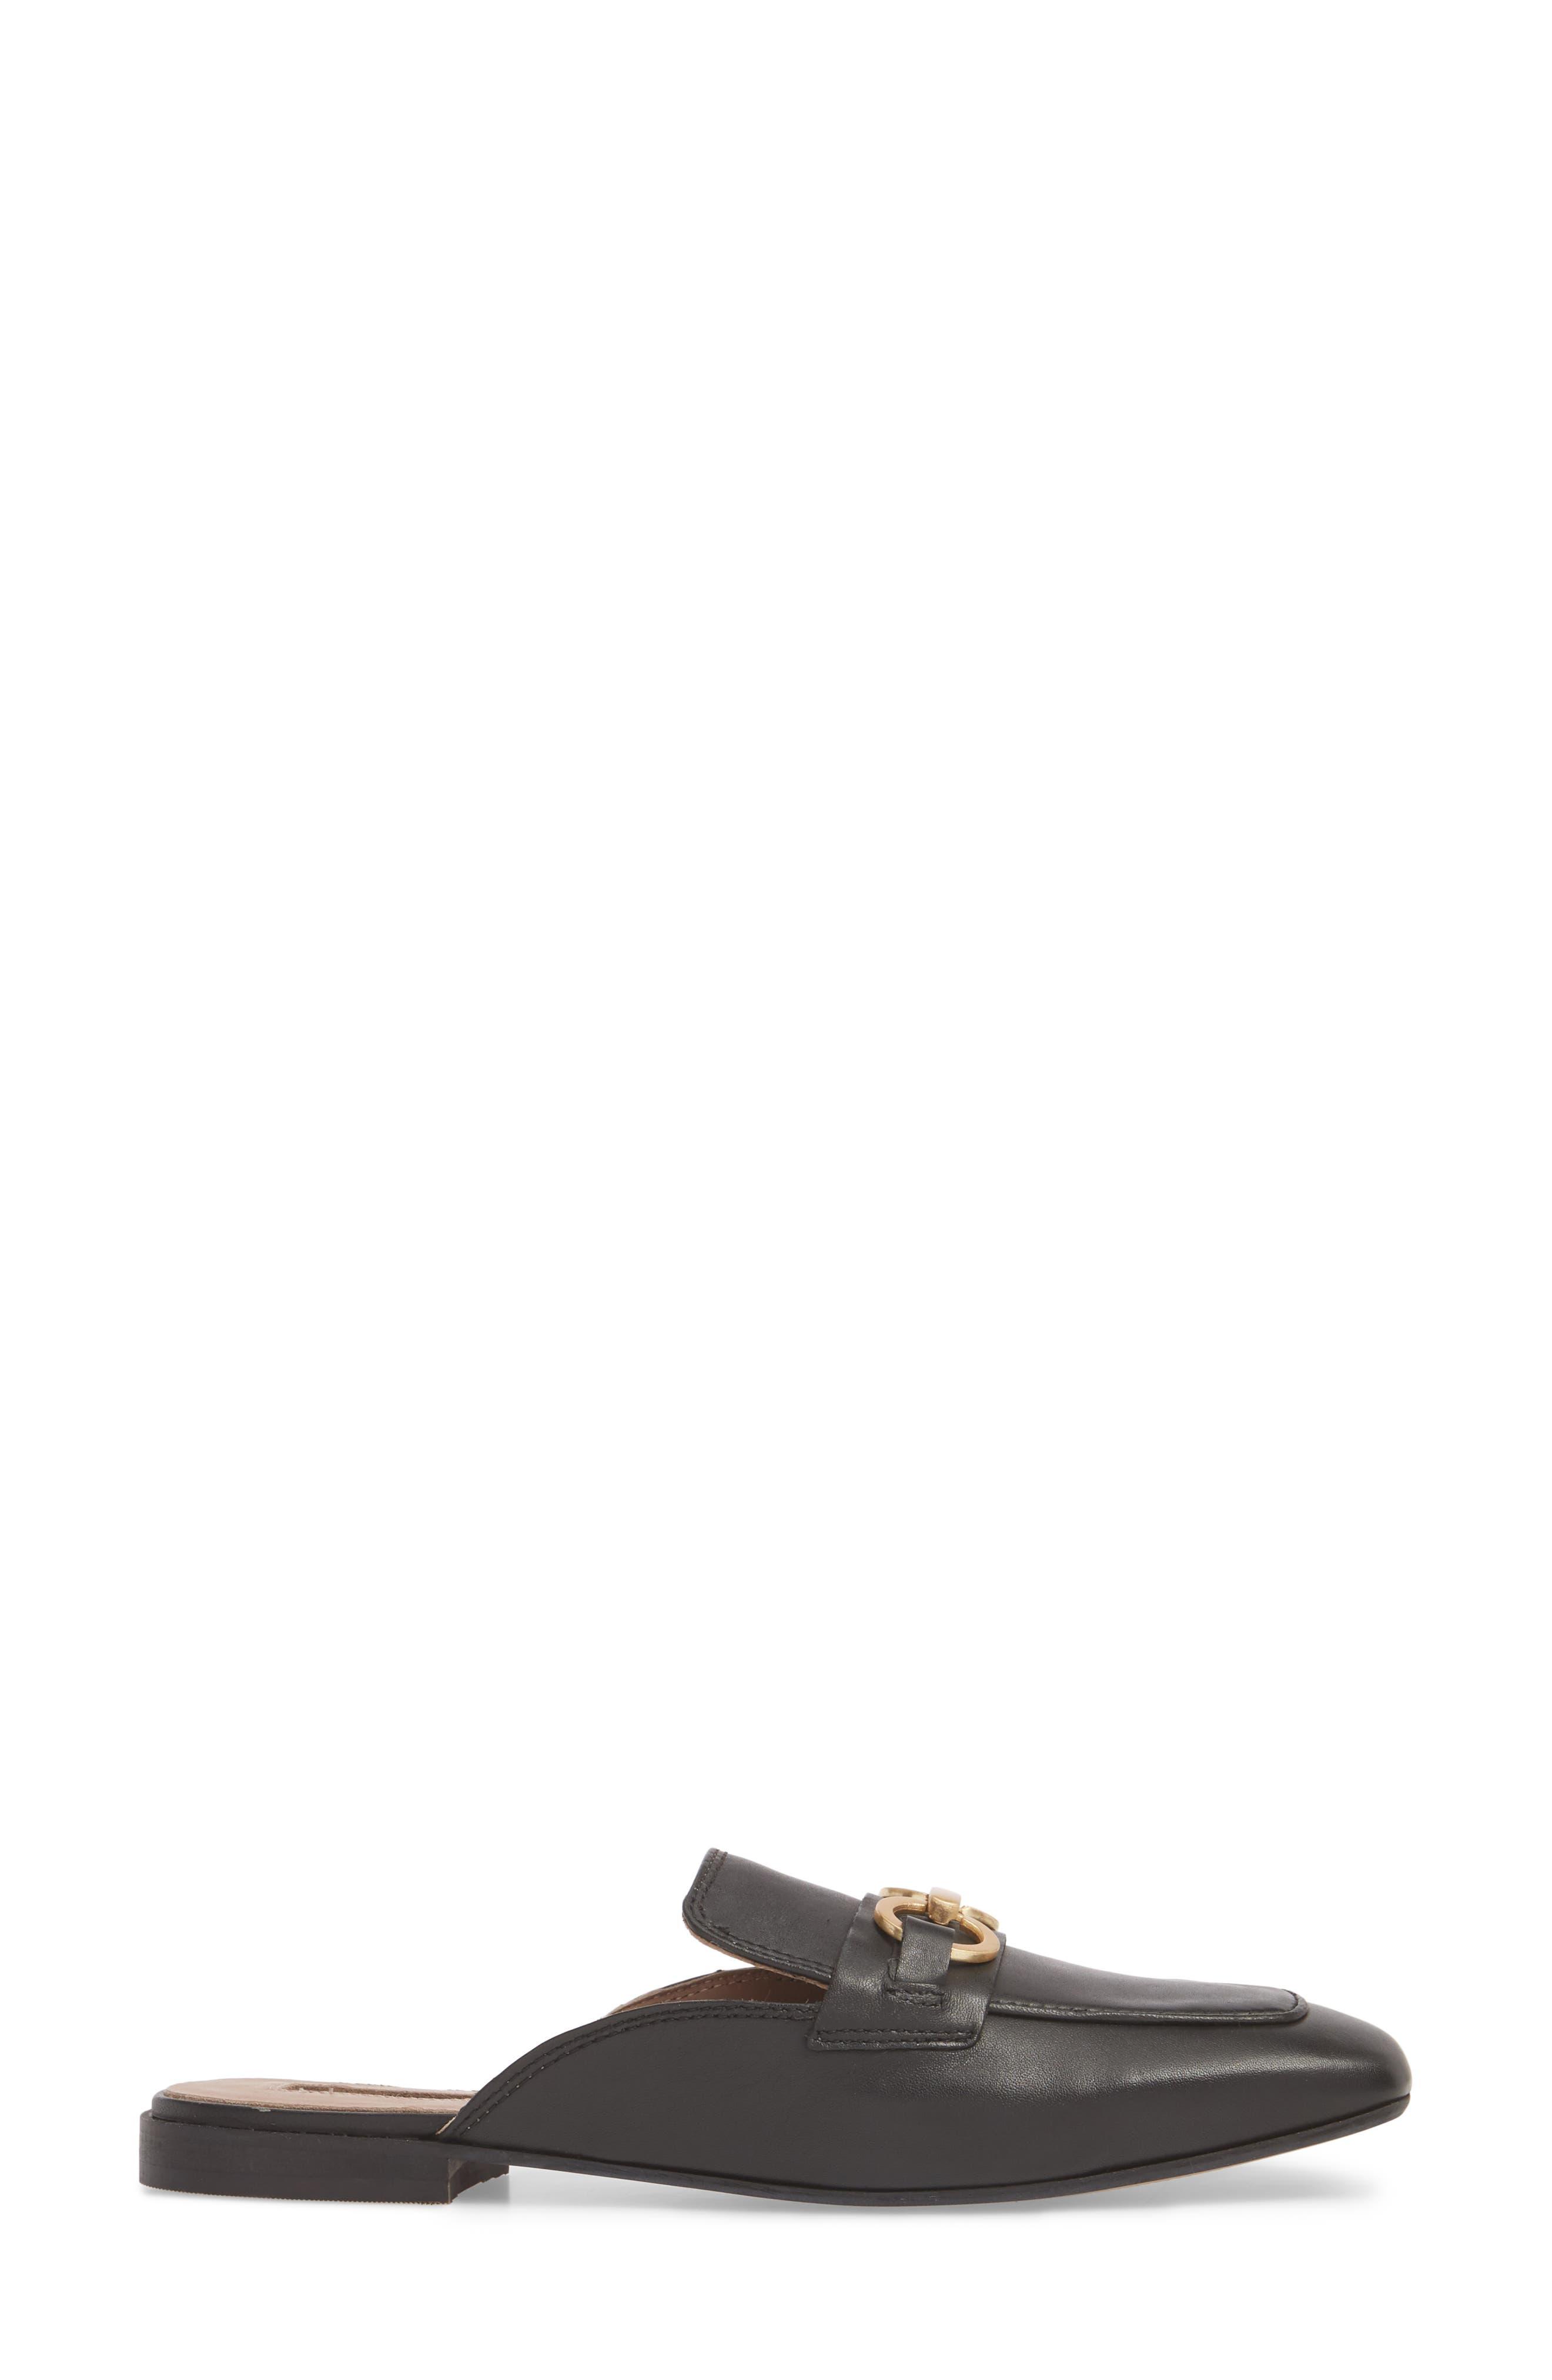 Kale Trim Loafer Mule,                             Alternate thumbnail 3, color,                             BLACK